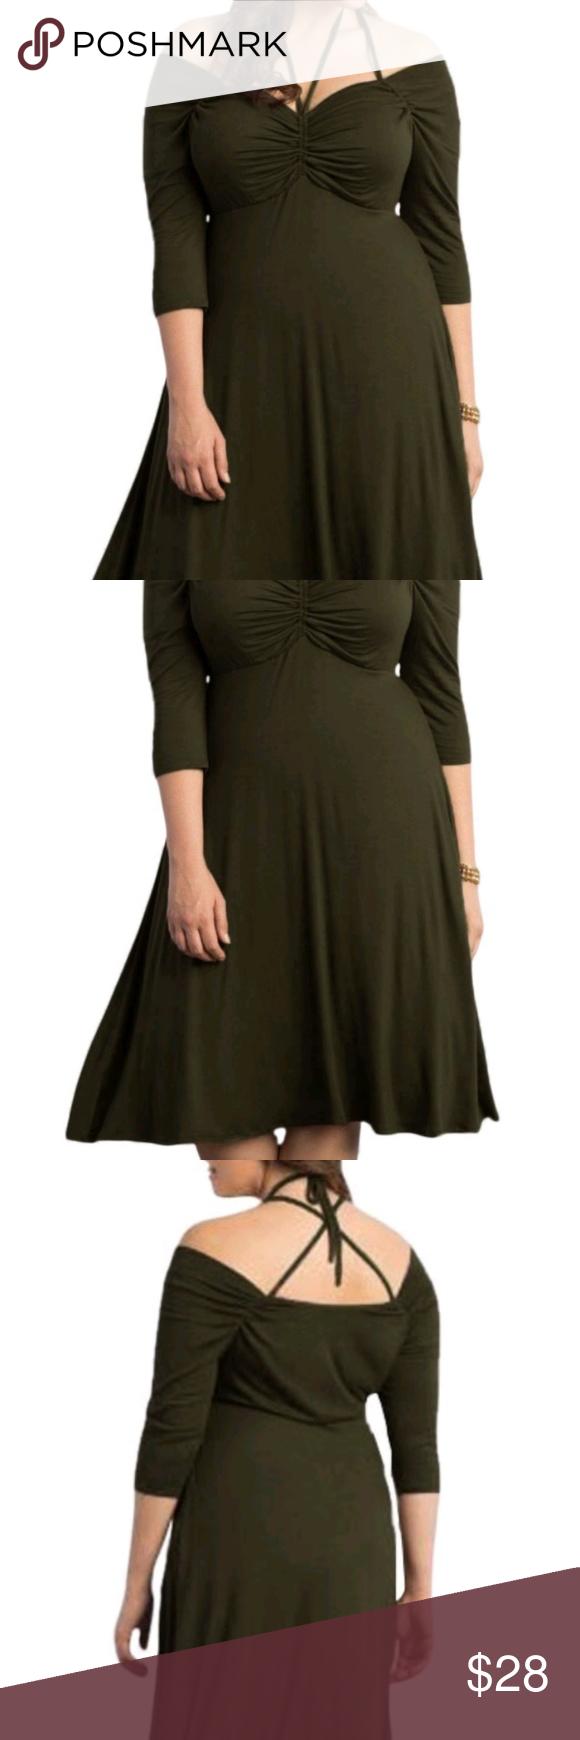 Plus size off shoulder sexy shift dress boutique lovely dresses